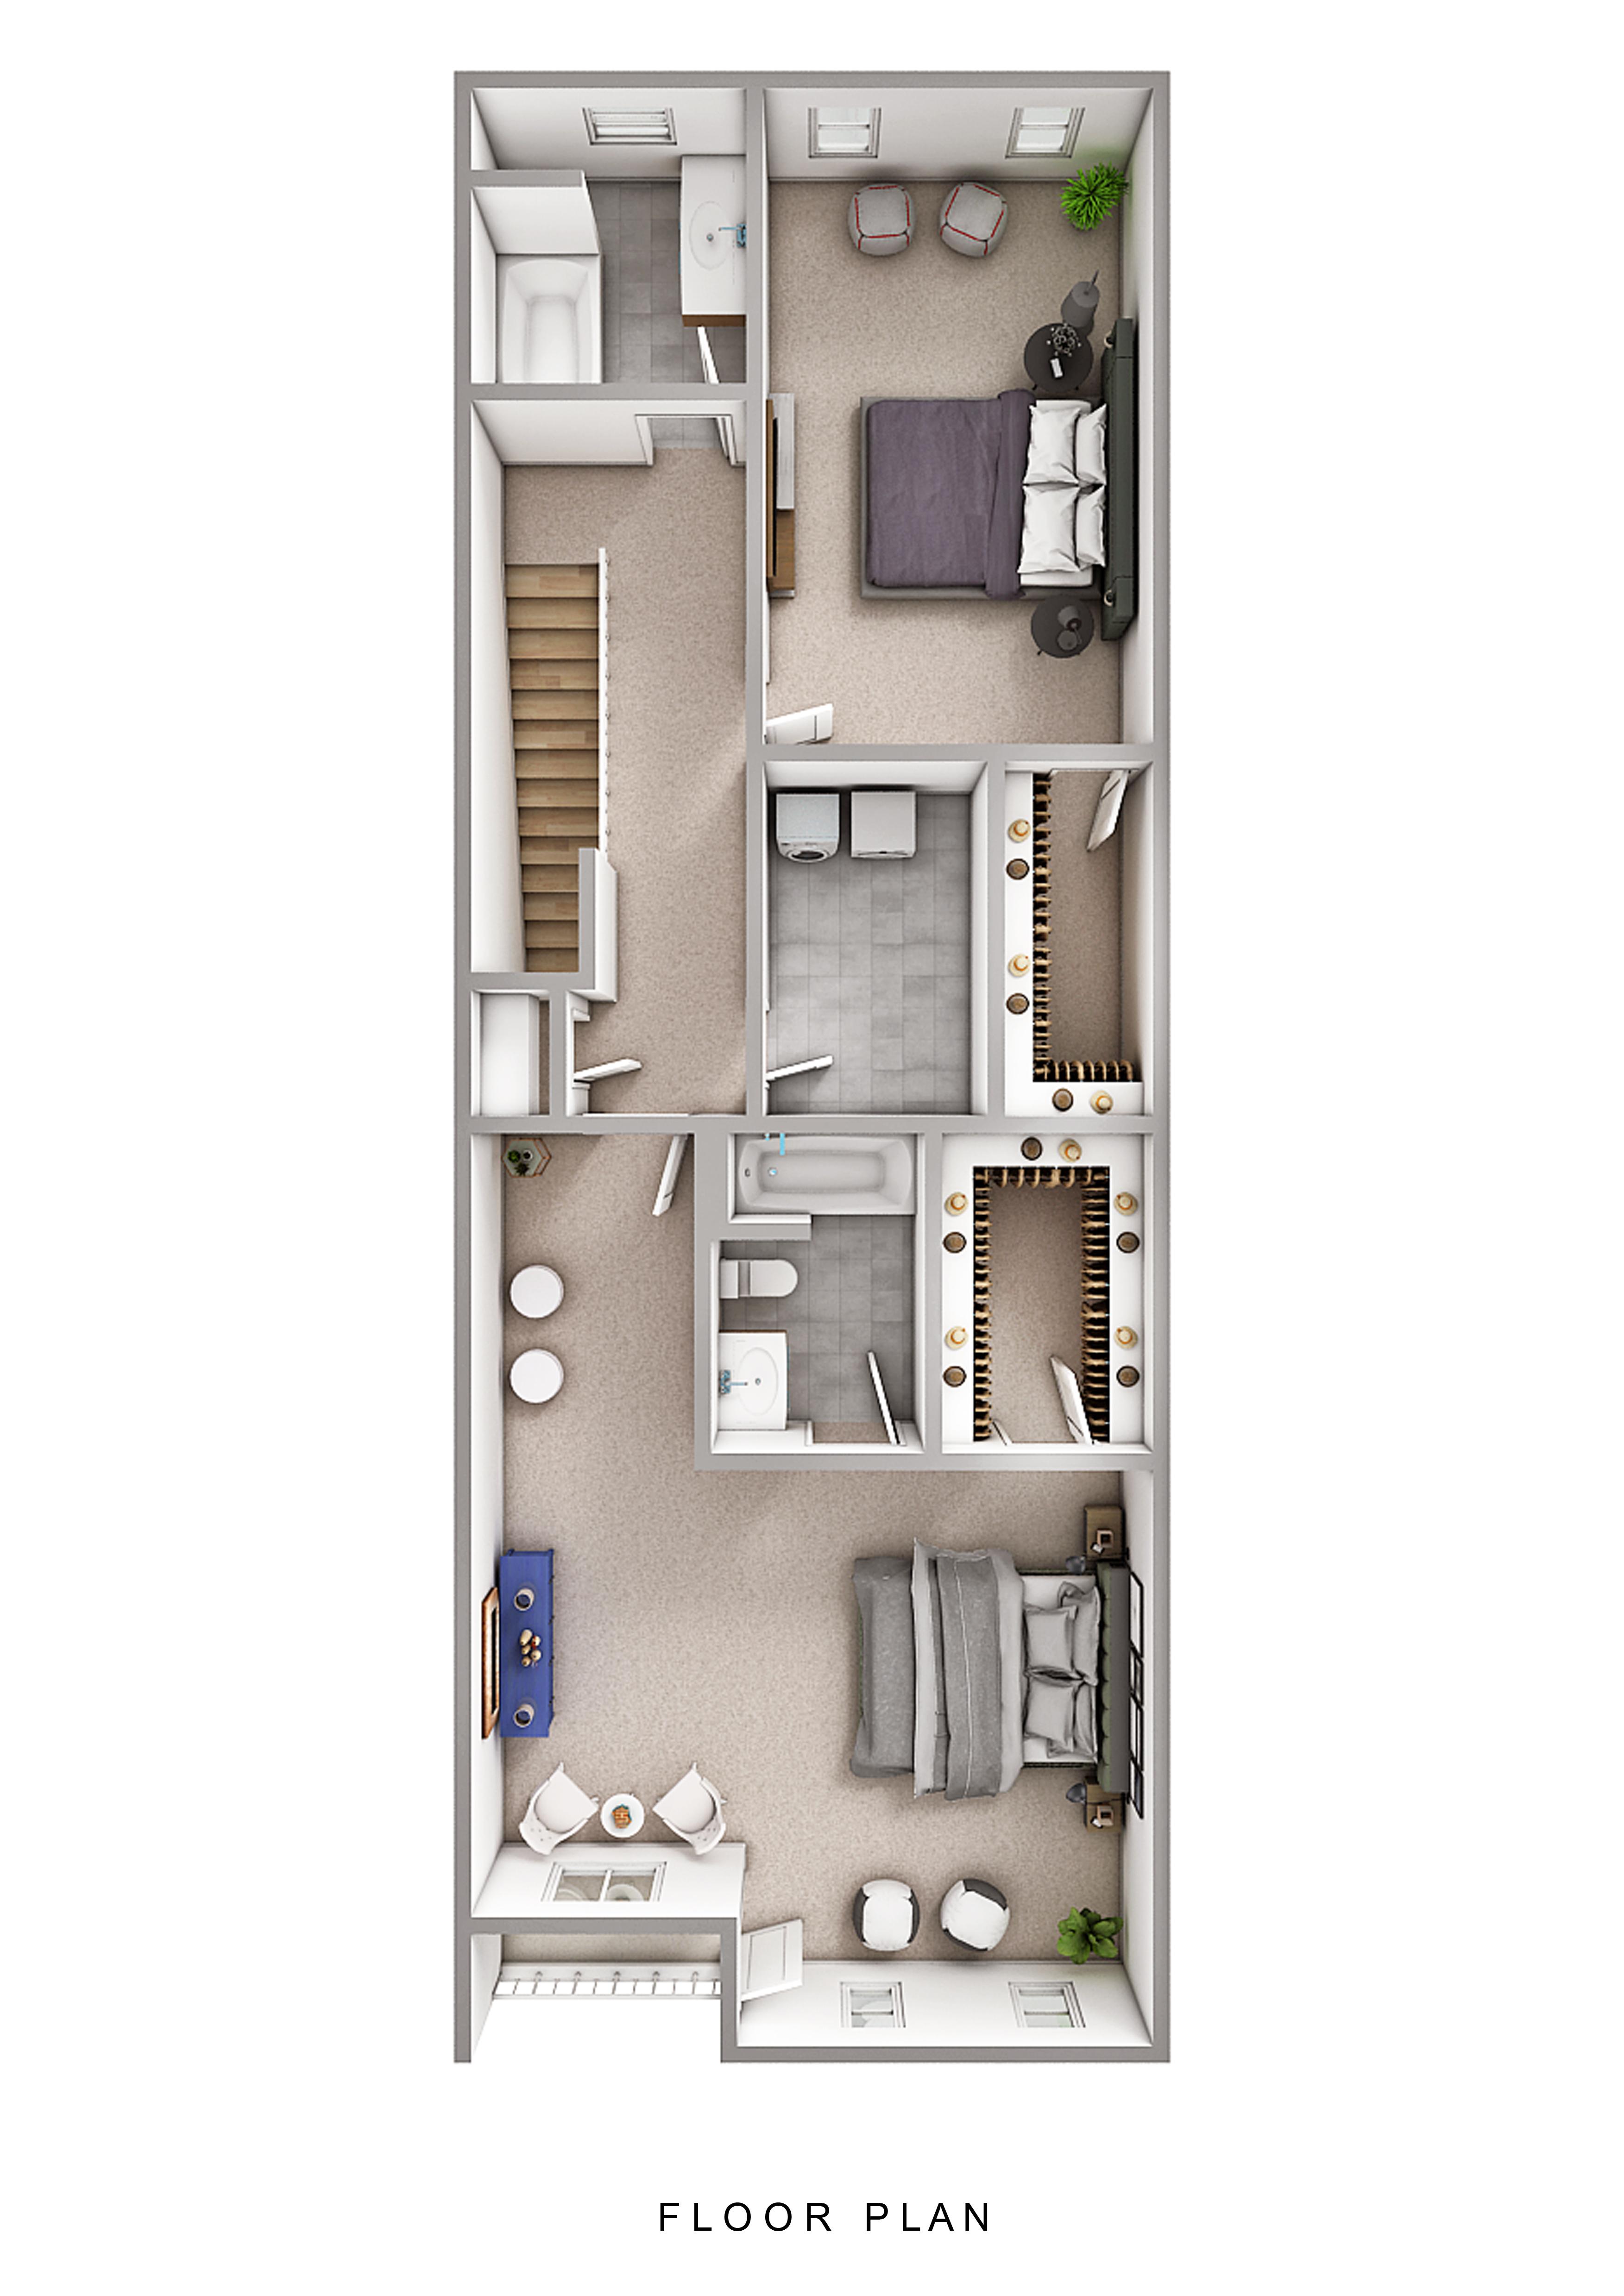 Floor plans haverhill ma condos for sale